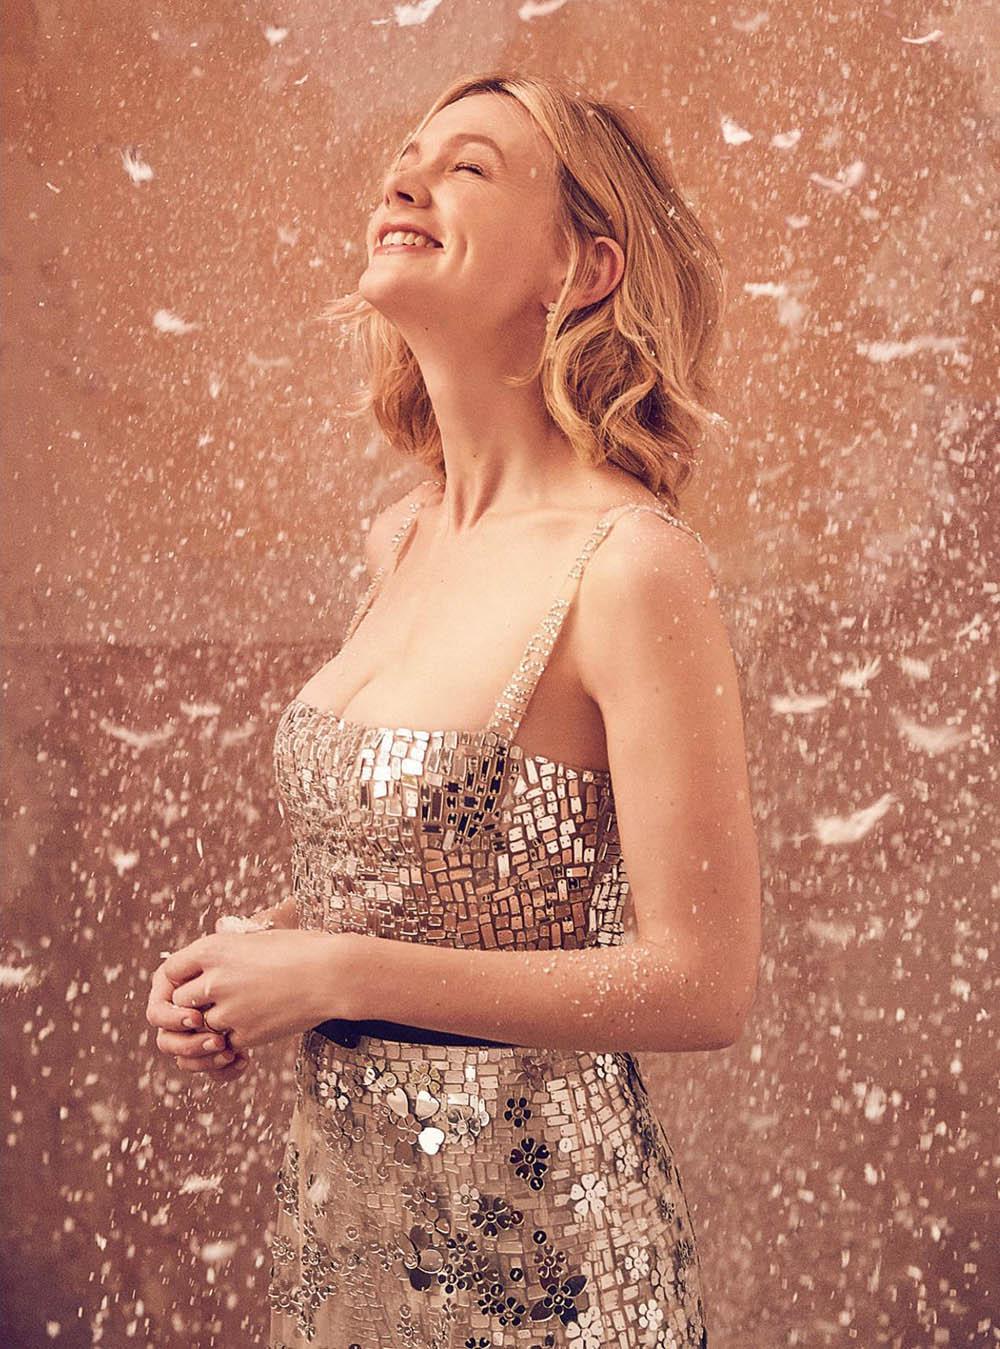 Carey Mulligan covers Harper's Bazaar UK January 2018 by Richard Phibbs